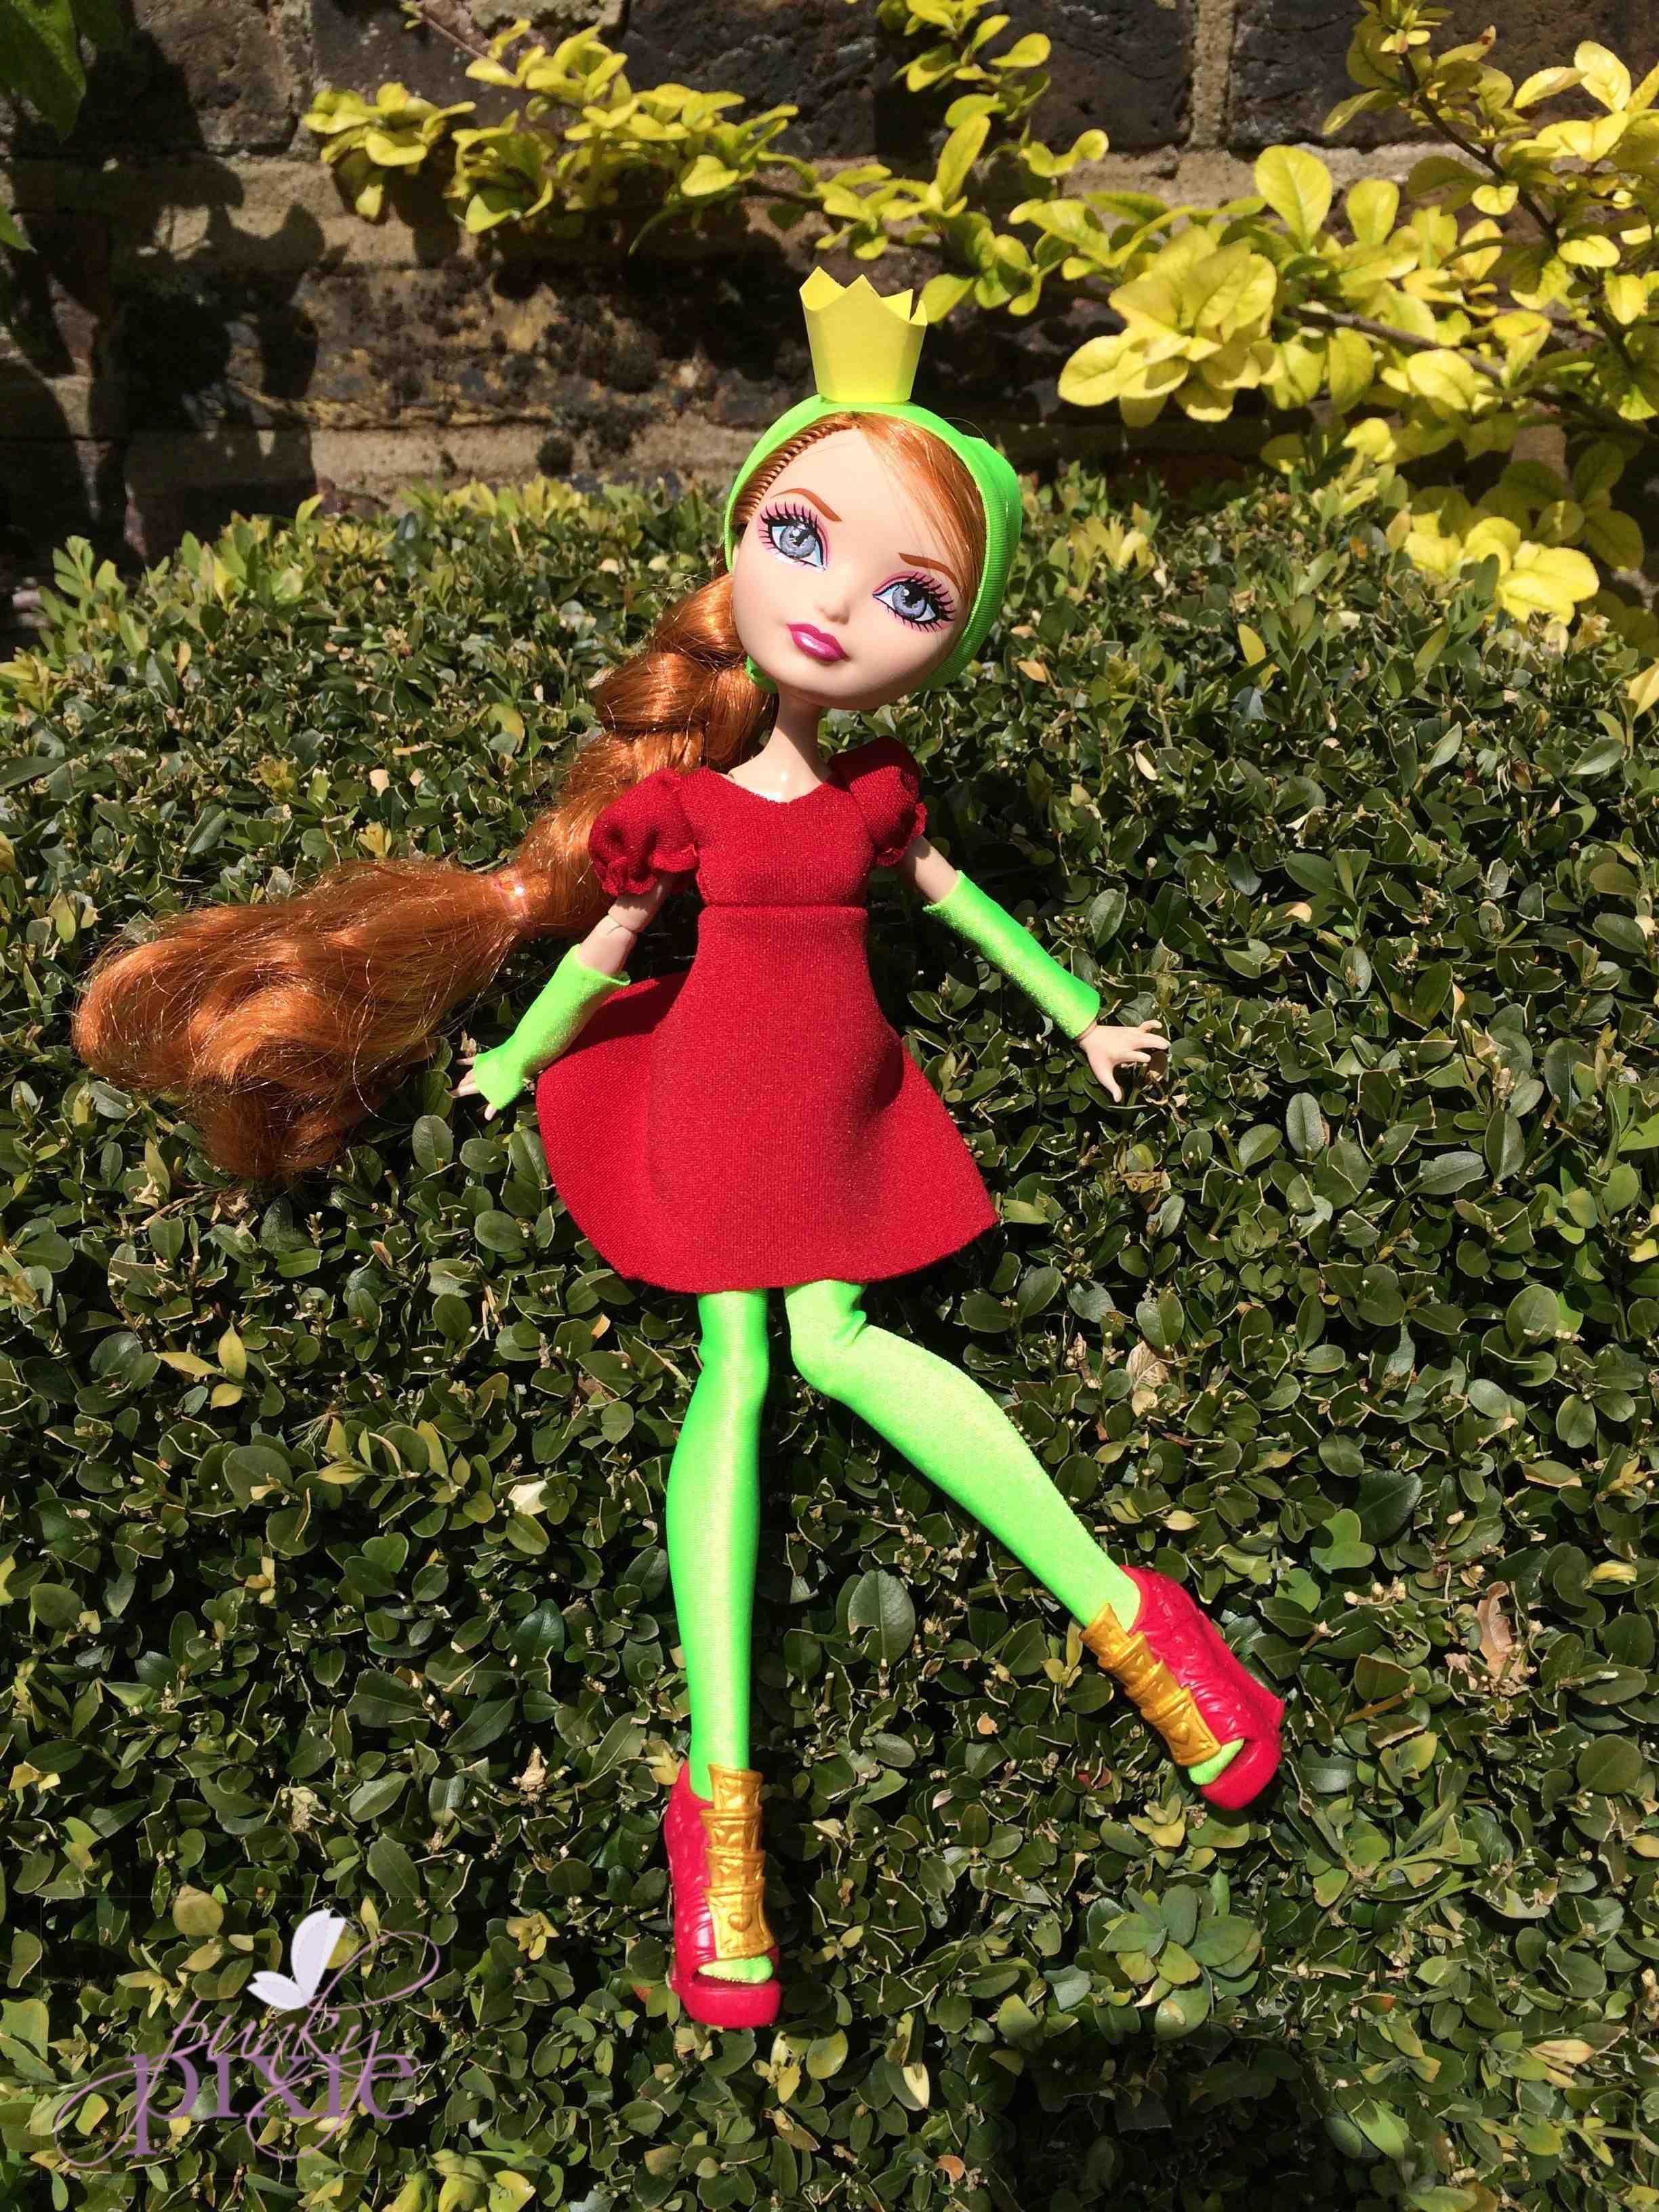 #Adventuretime #Princesses Wildberry Princess